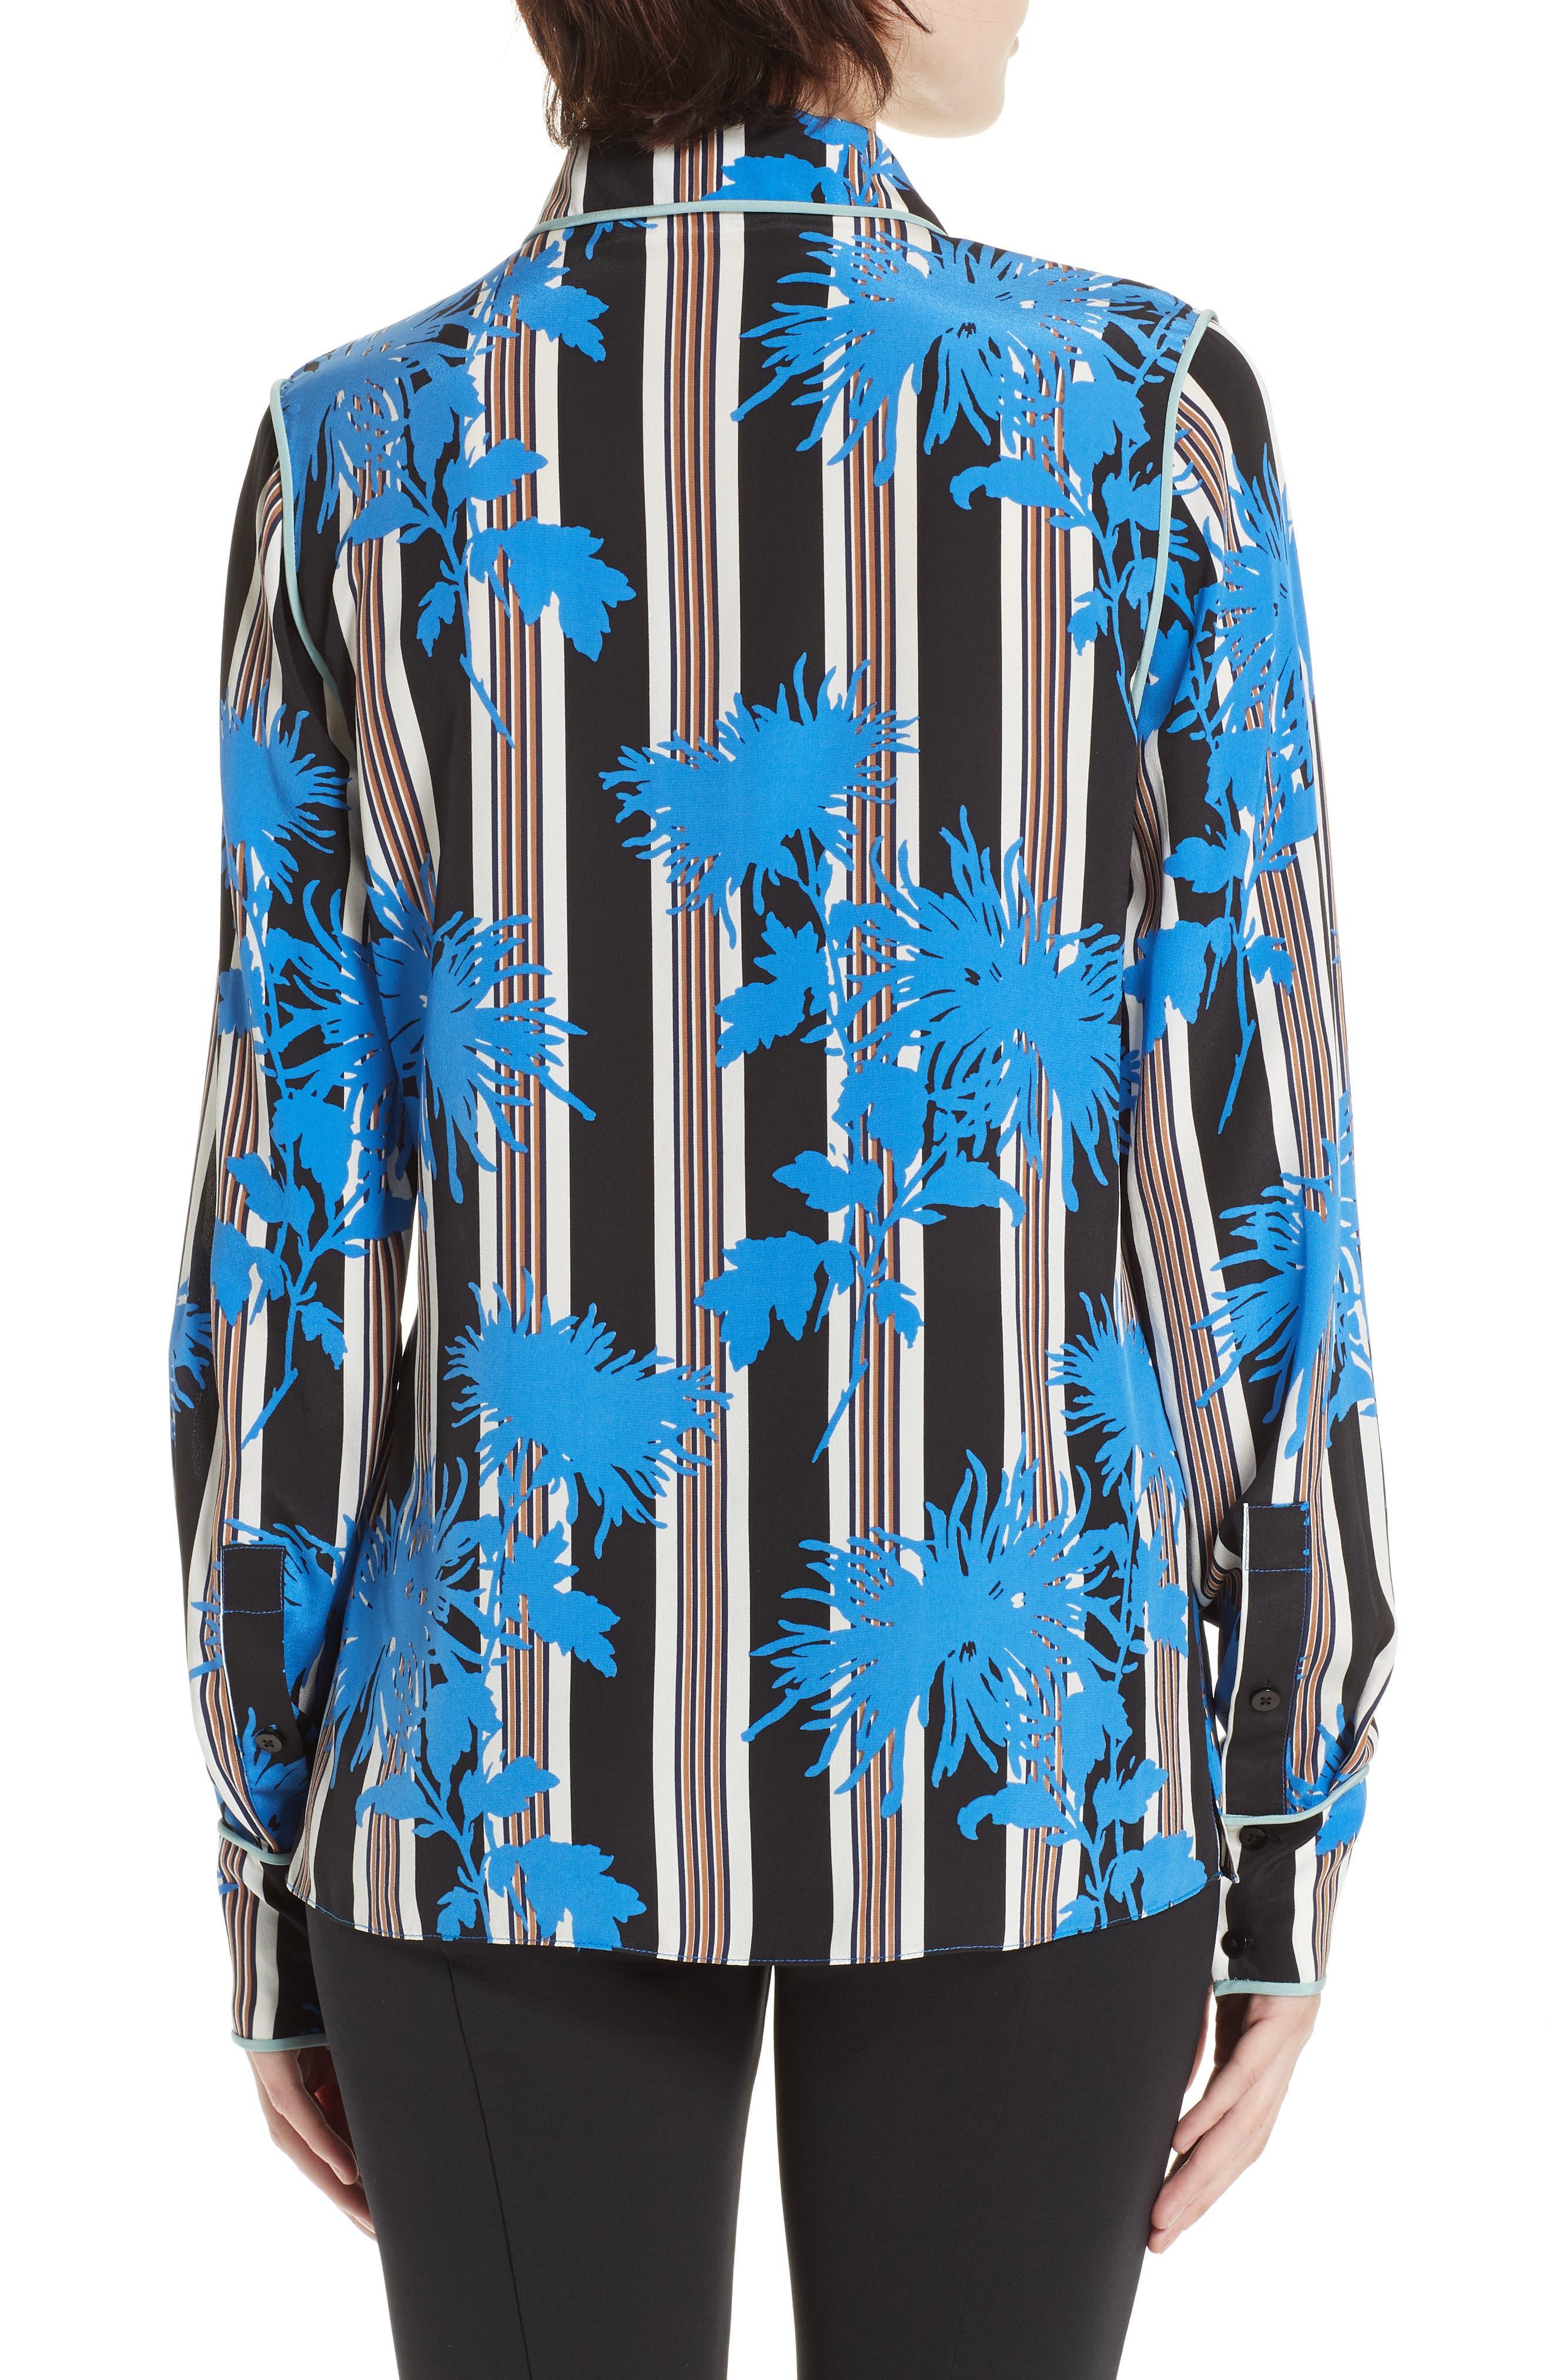 Diane von Furstenberg Floral Print Silk Shirt,                             Alternate thumbnail 2, color,                             SHELFORD B